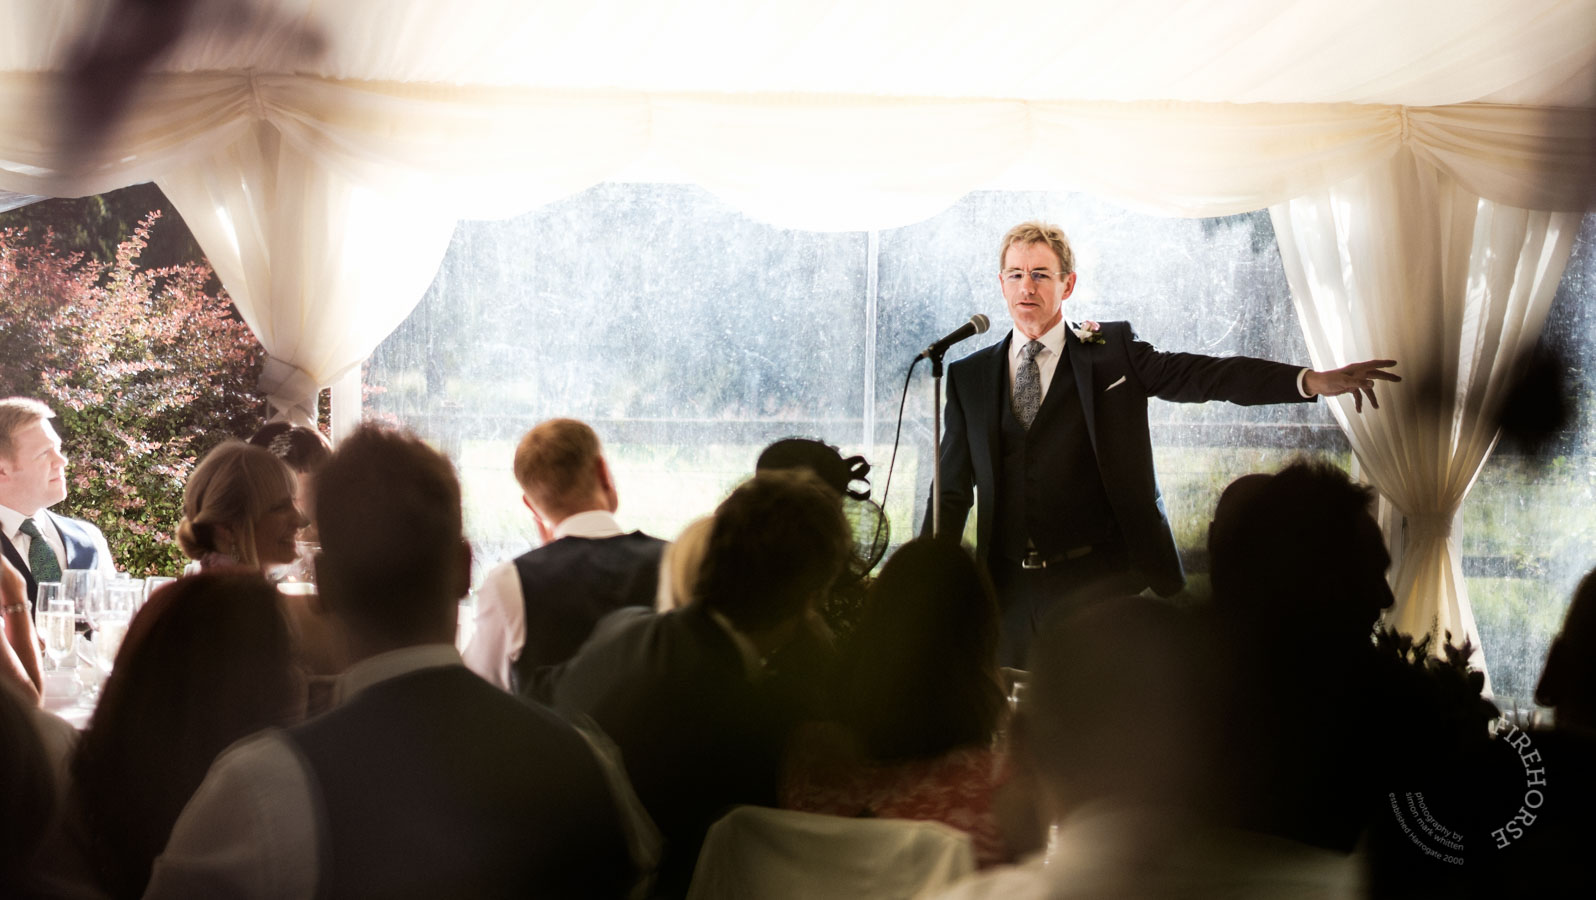 Sportsmans-Arms-Wedding-075